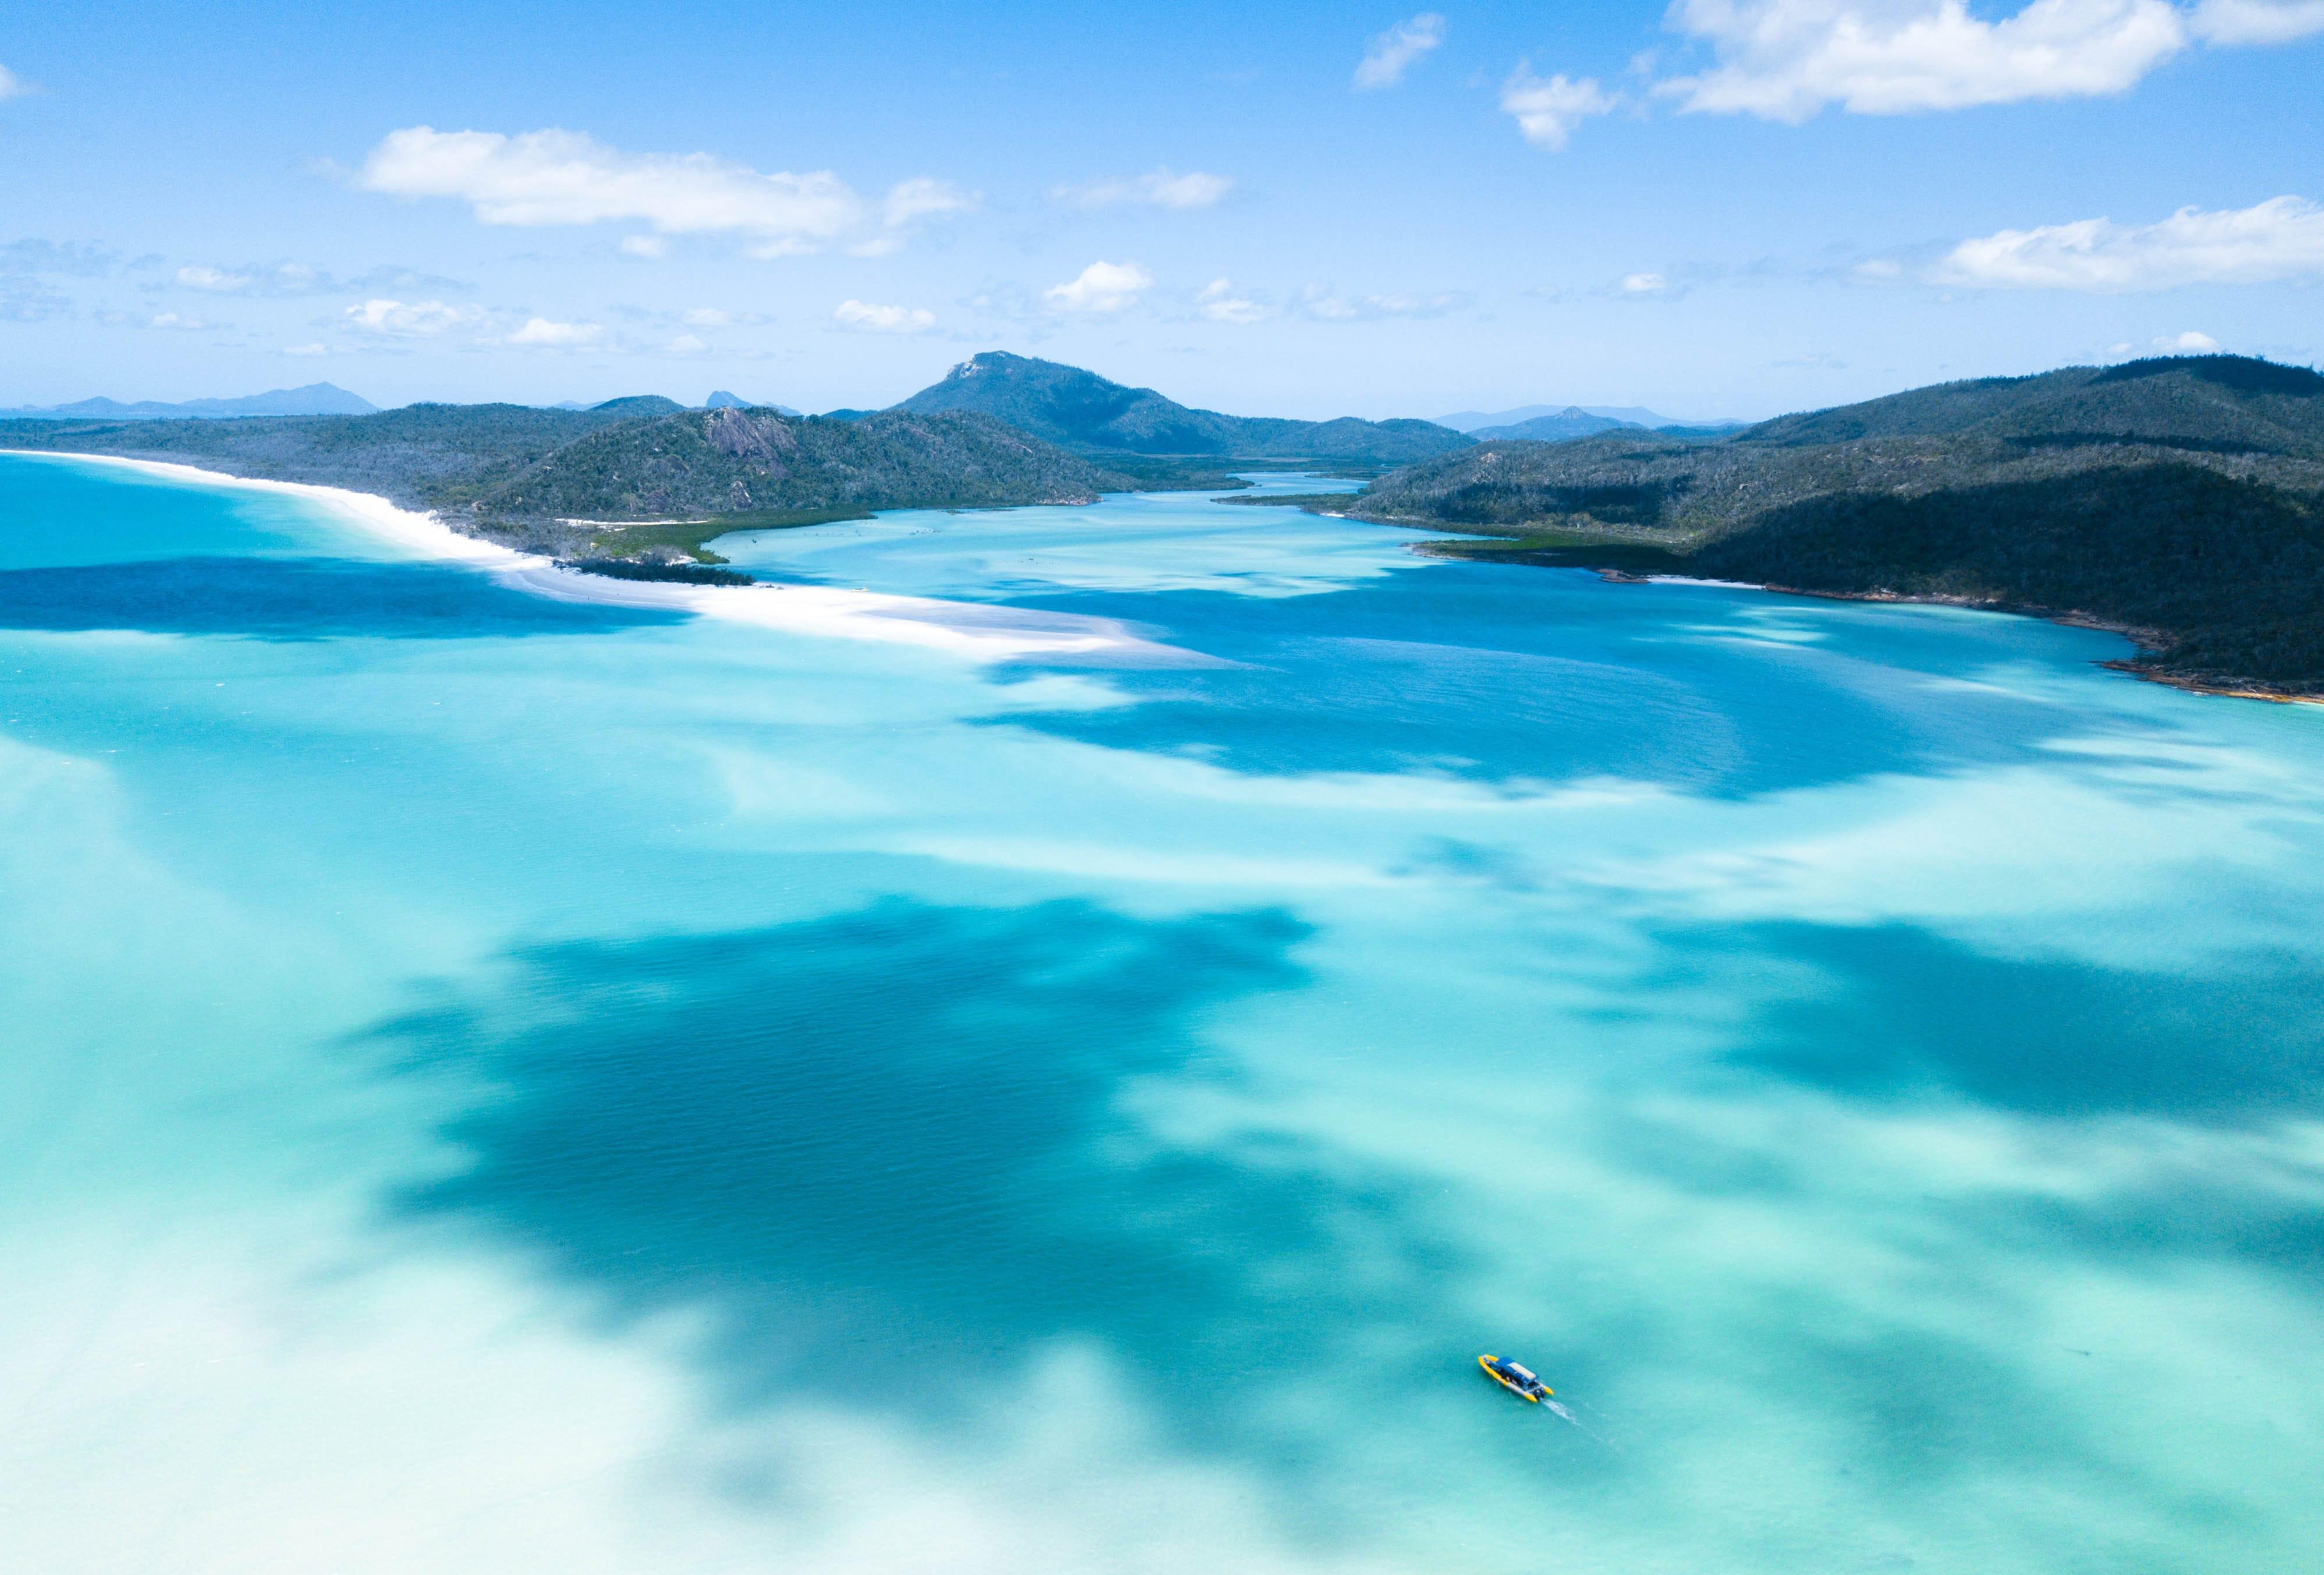 cote est australie Whitsunday Islands